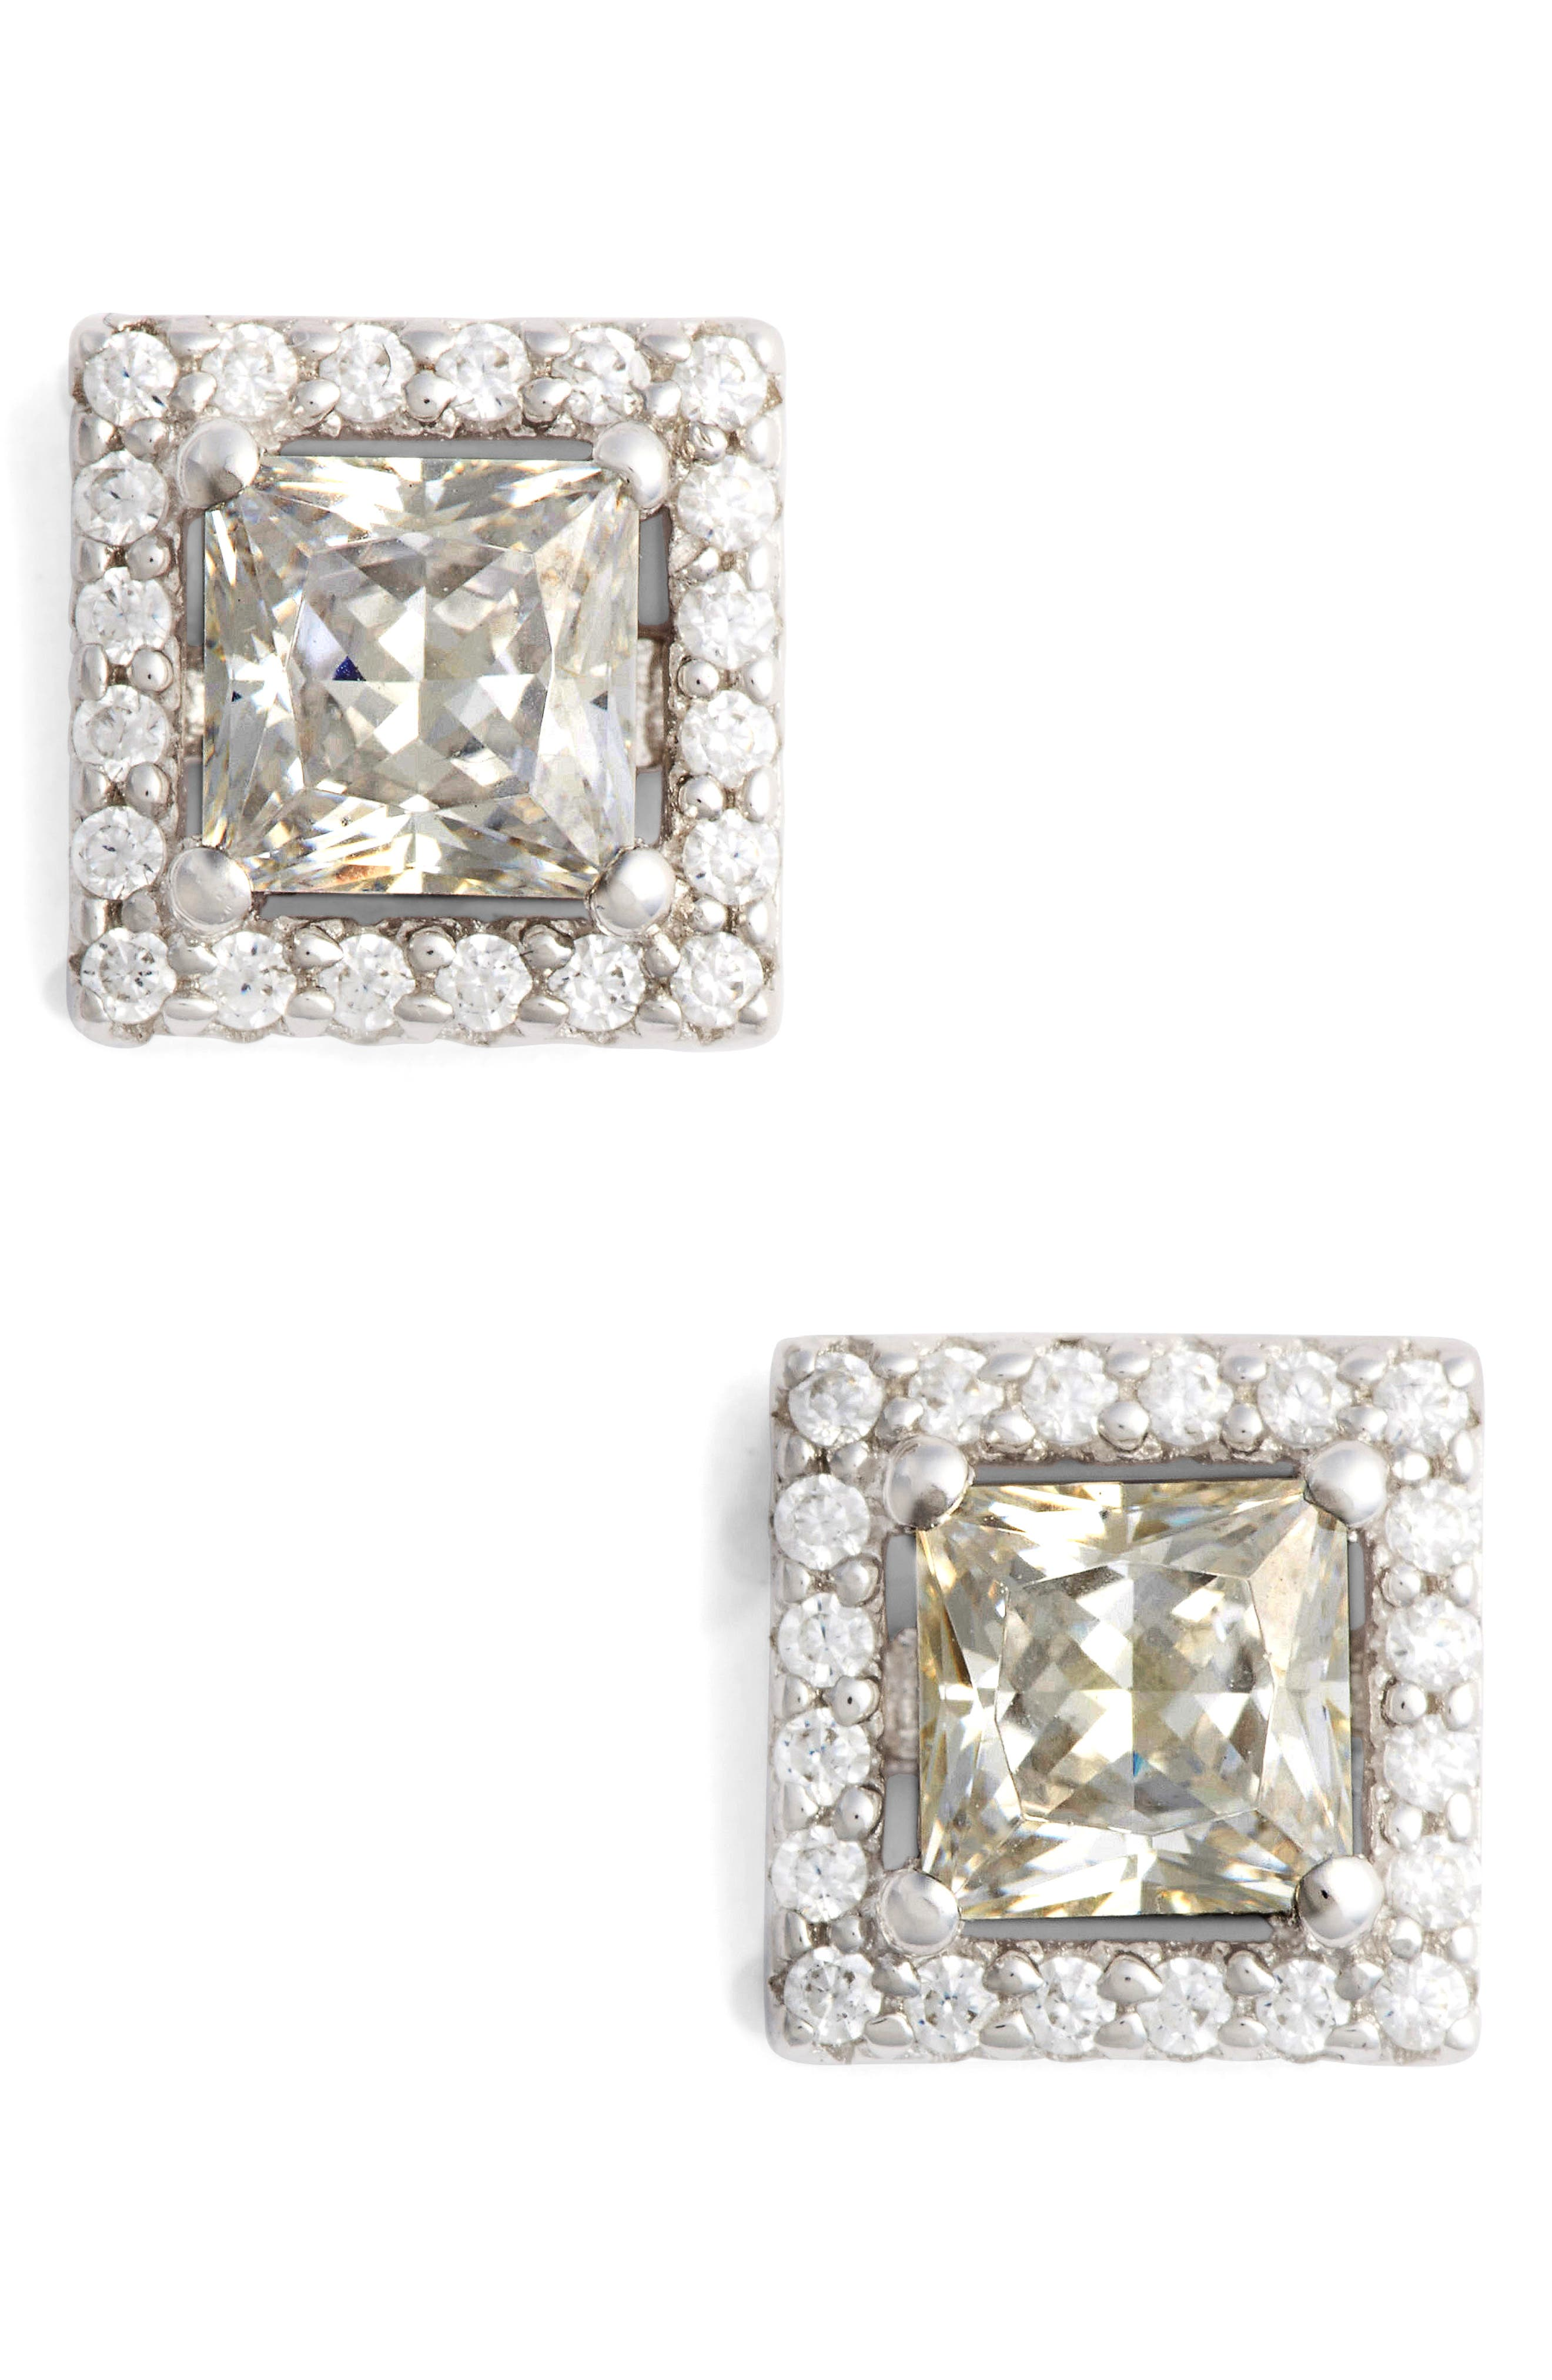 Princess Cut Simulated Diamond Stud Earrings,                         Main,                         color, SILVER/ CLEAR